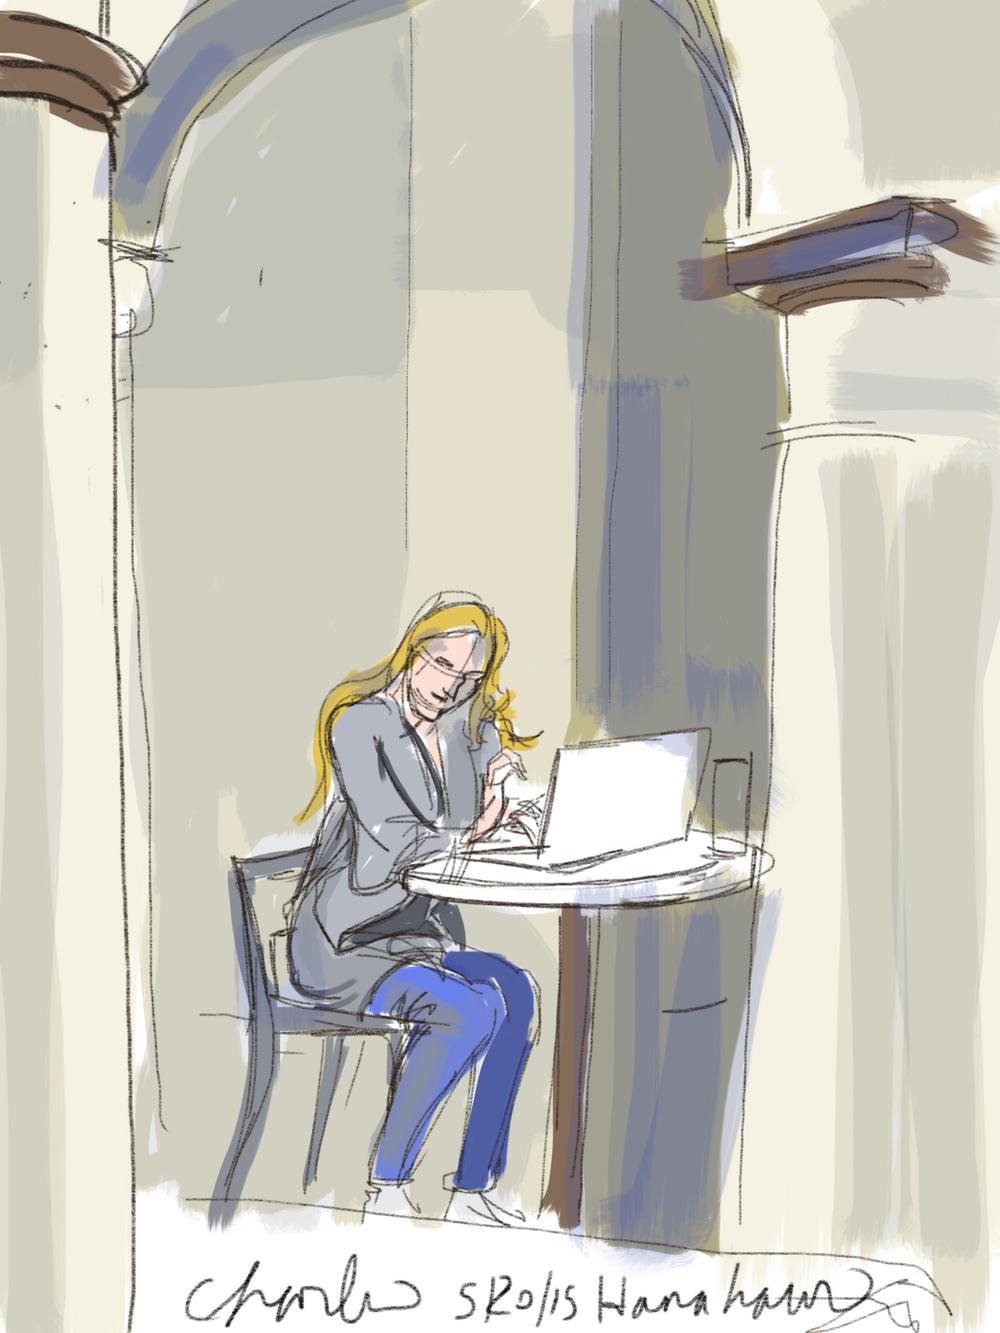 Woman in Hanahaus Courtyard.